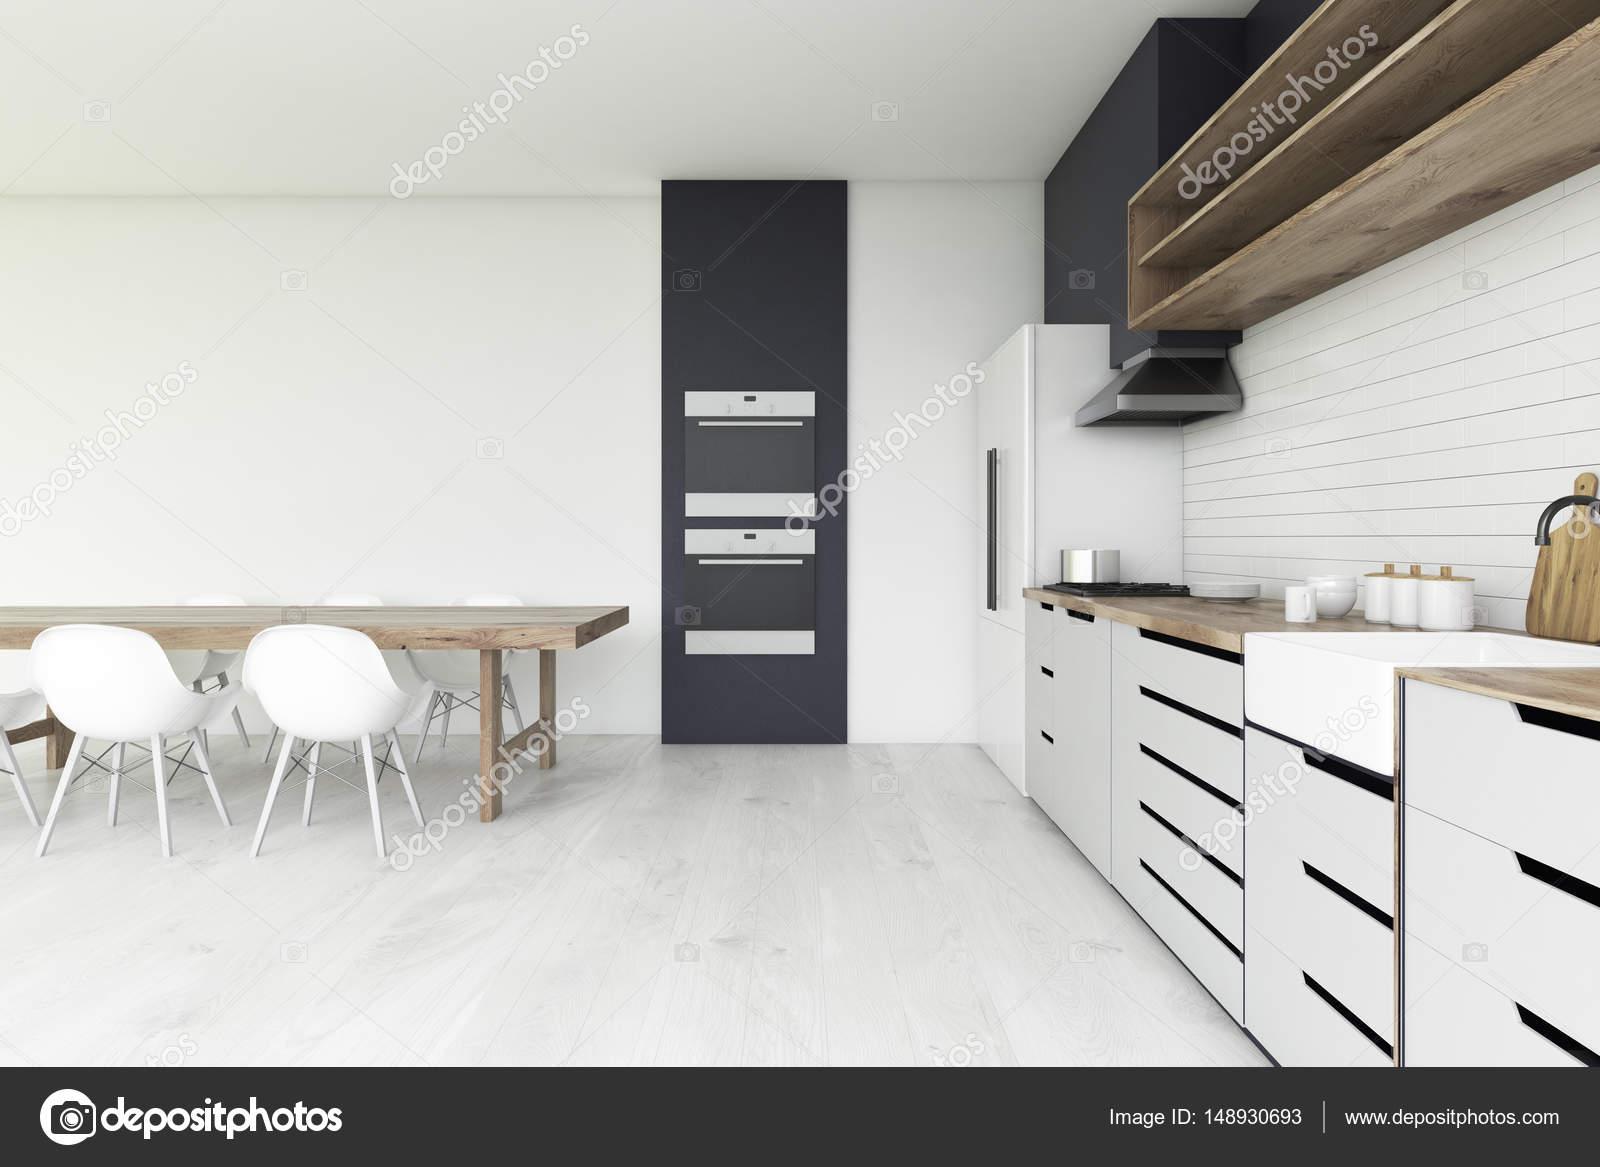 Twee oven keuken betonnen vloer u stockfoto denisismagilov